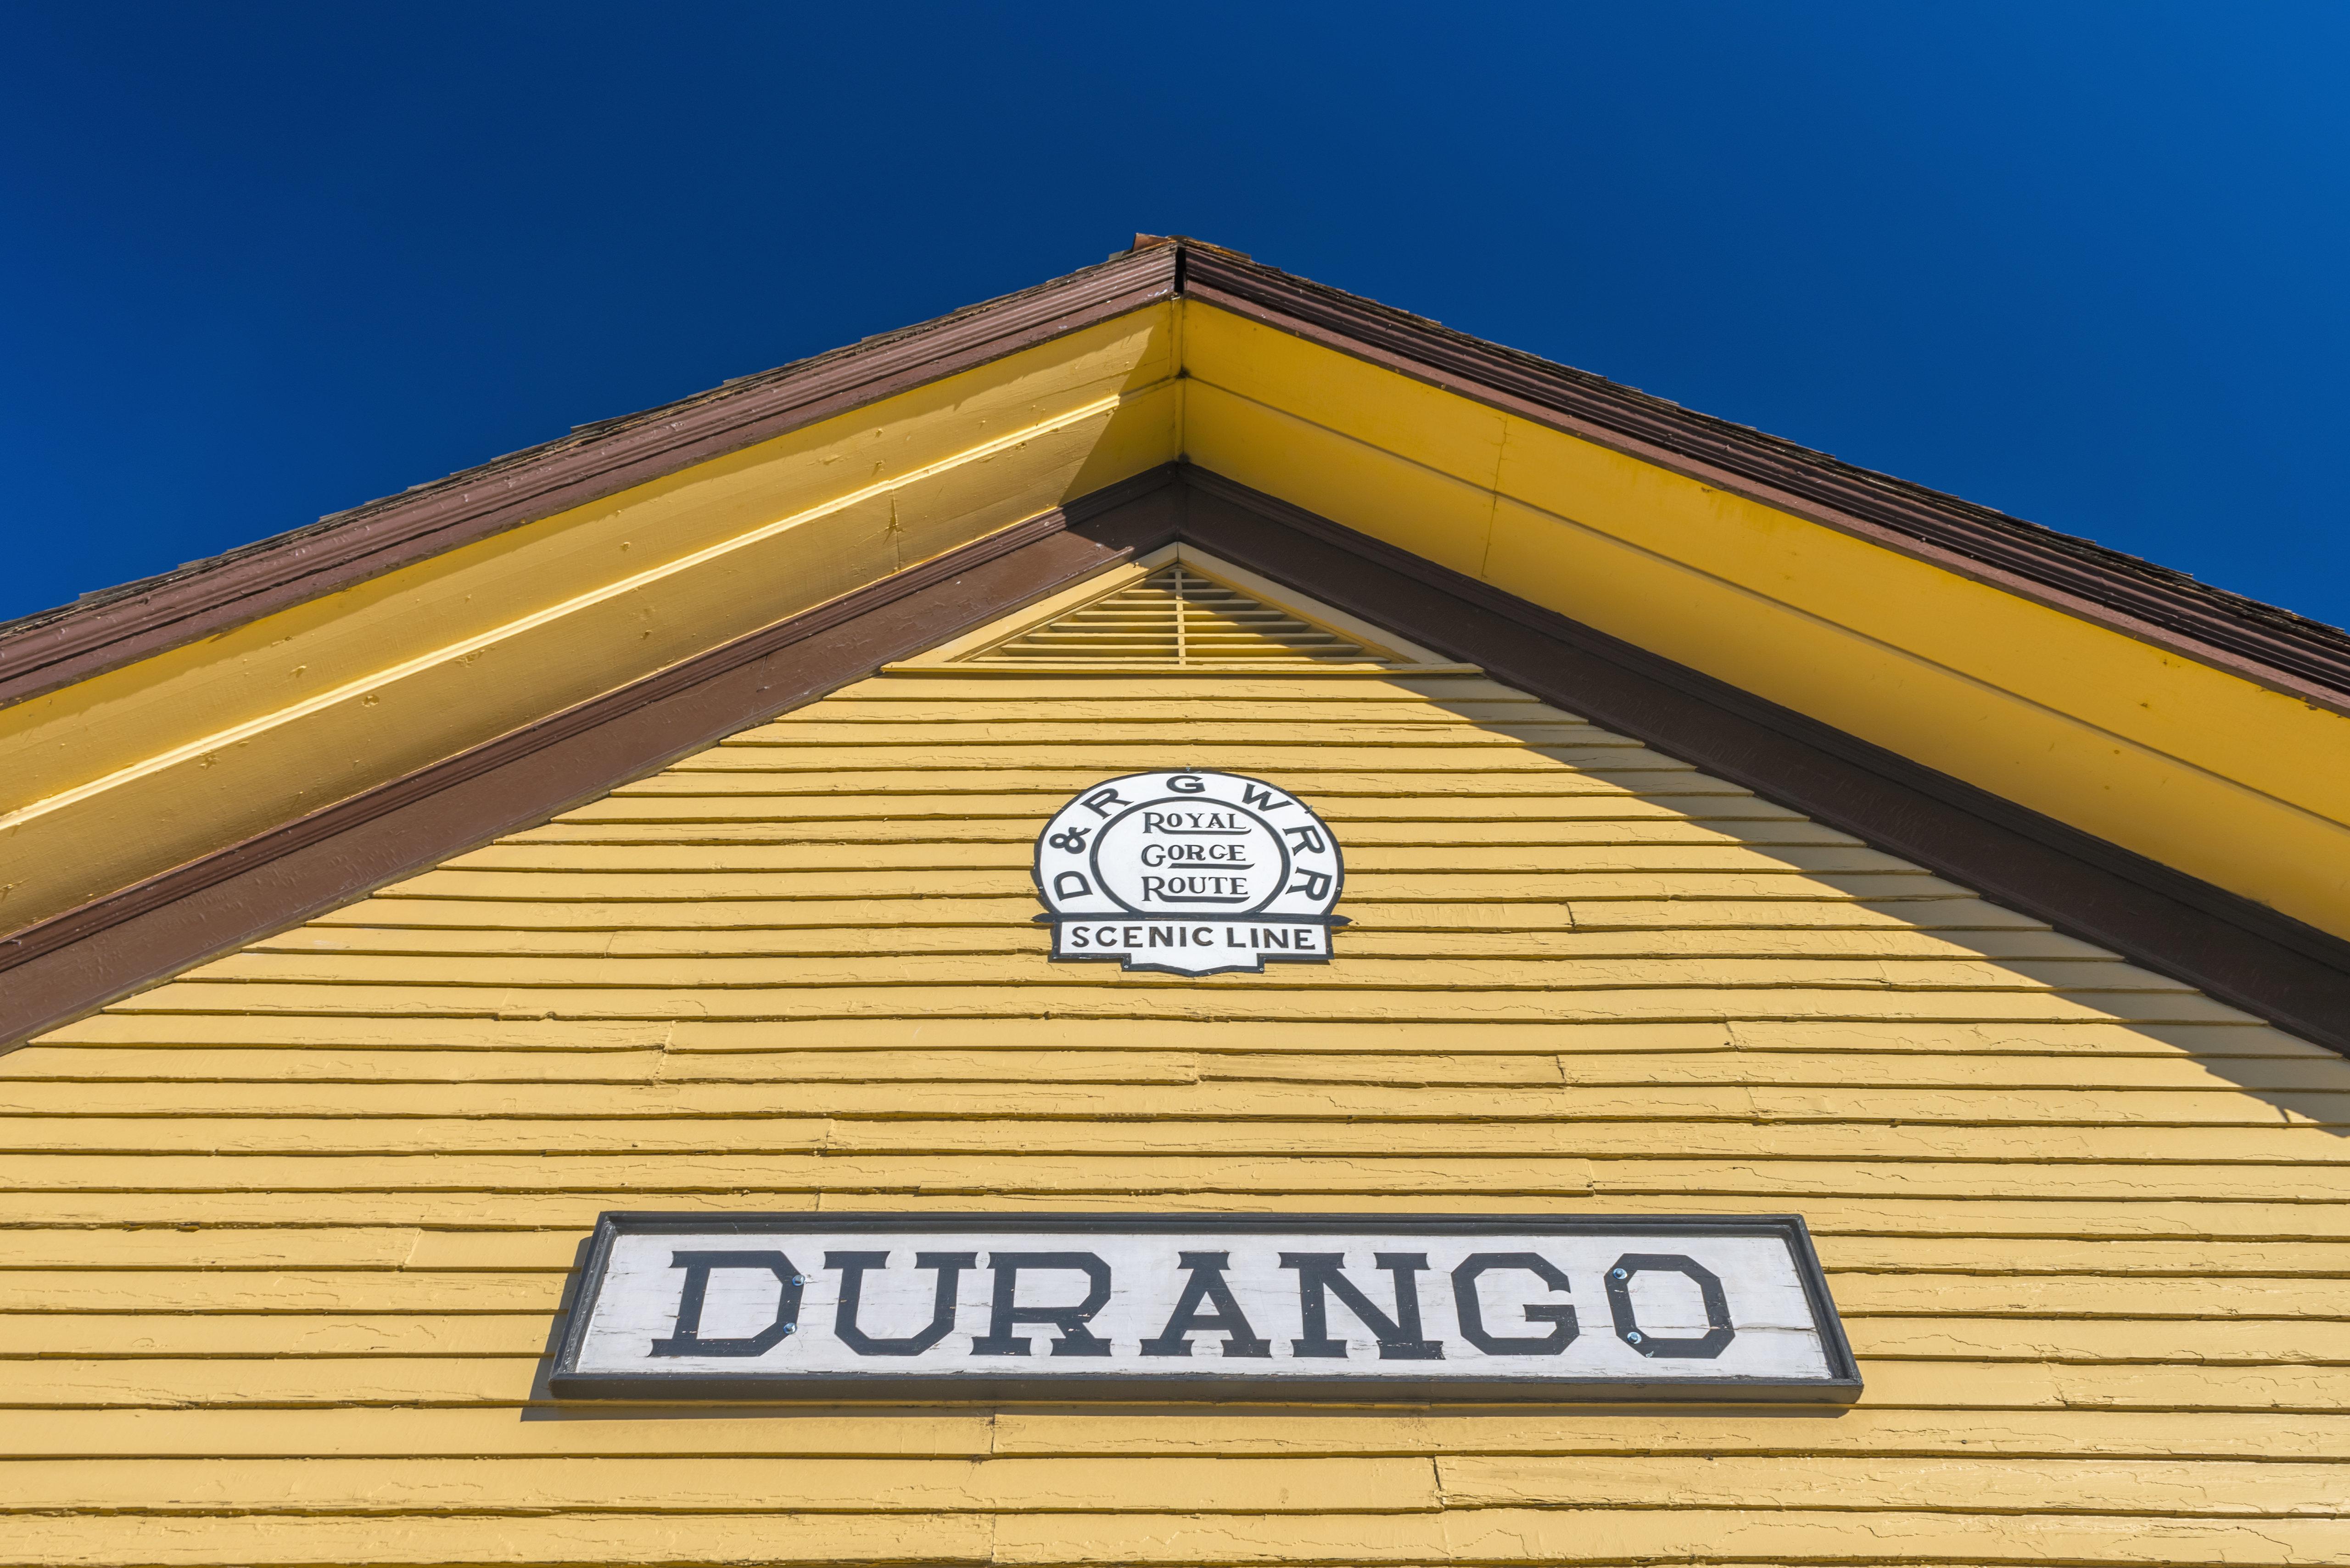 USA, Colorado, Durango, Railway Station for Durango and Silverton Narrow Gauge Railroad